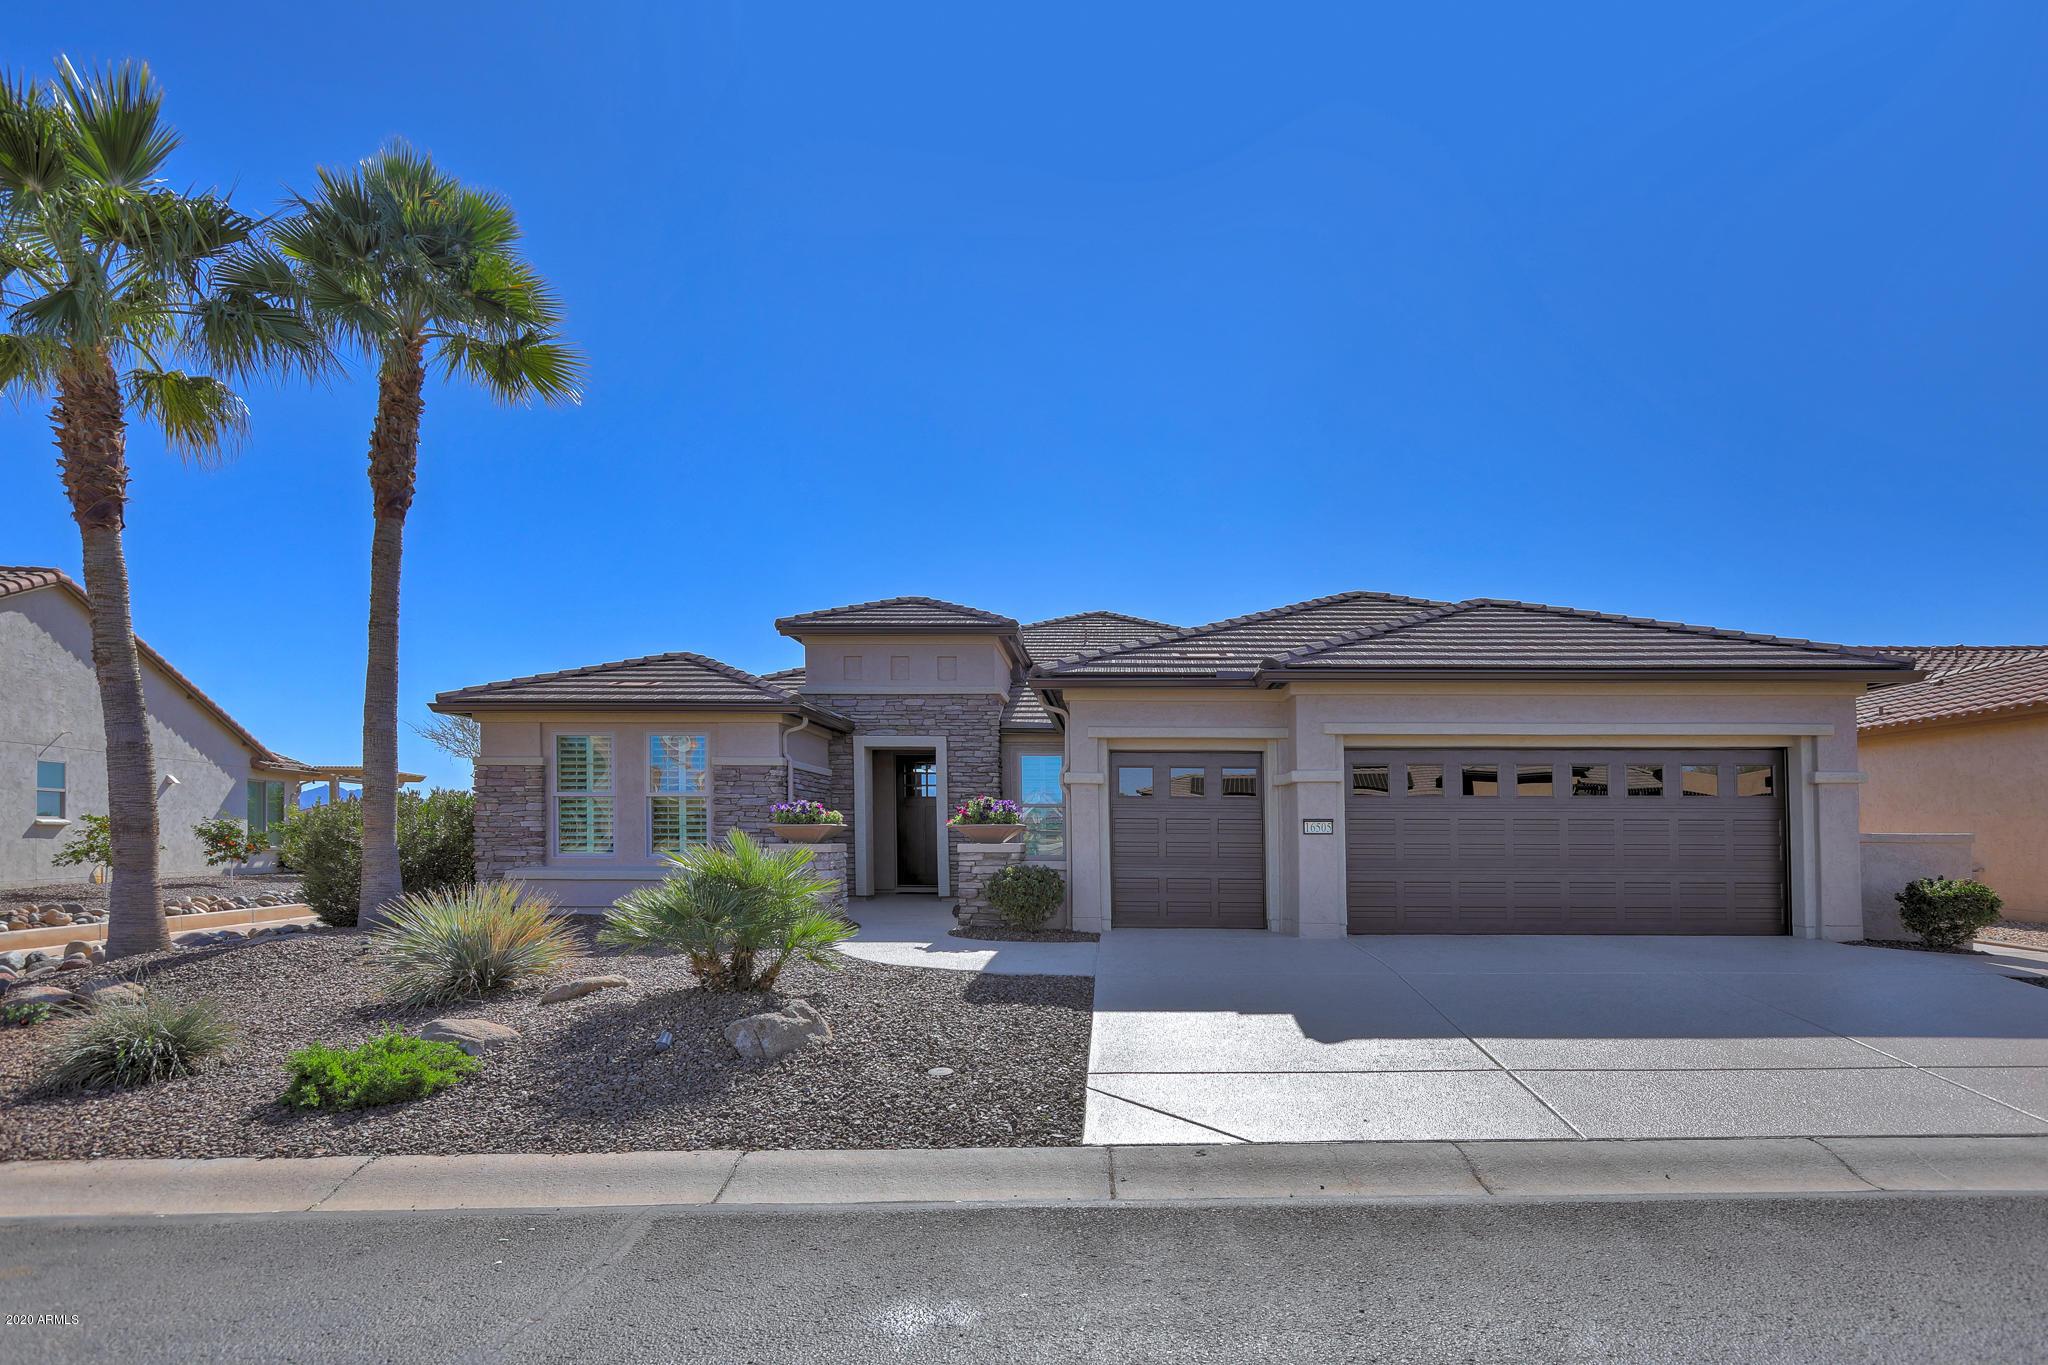 Photo of 16505 W Holly Street, Goodyear, AZ 85395